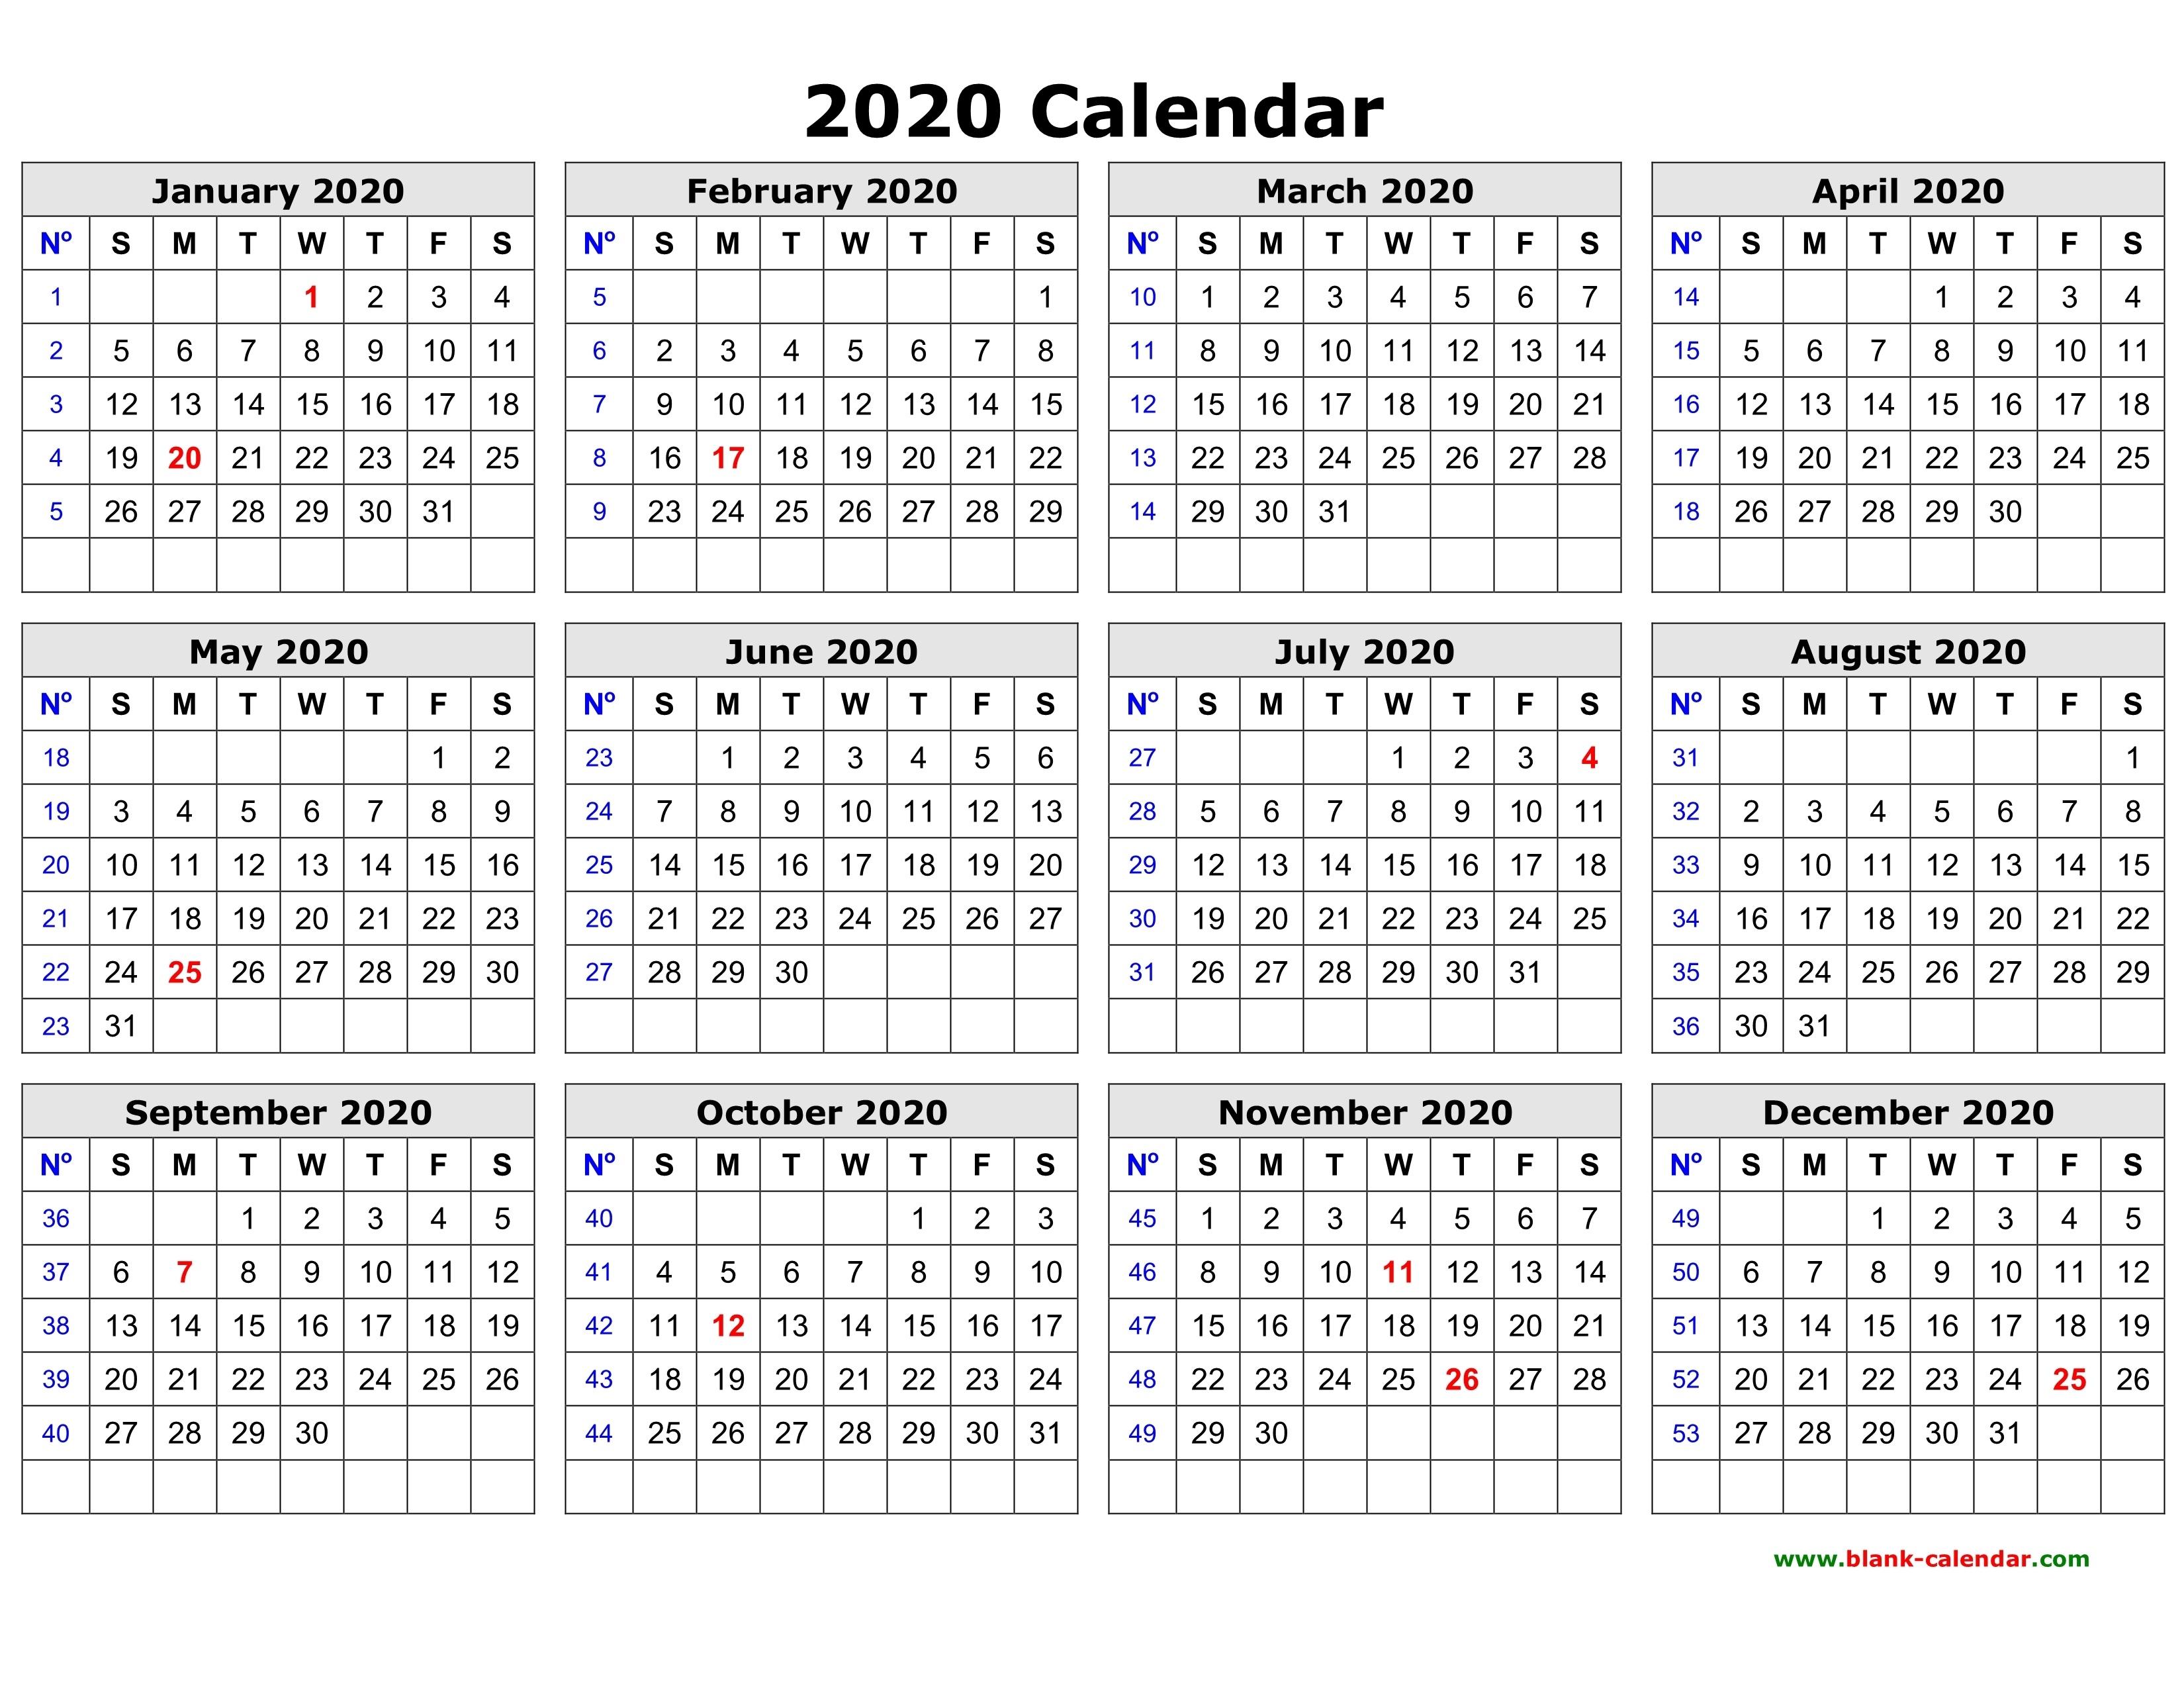 Free Download Printable Calendar 2020 In One Page, Clean Design._Printable Calendar Blank 2020